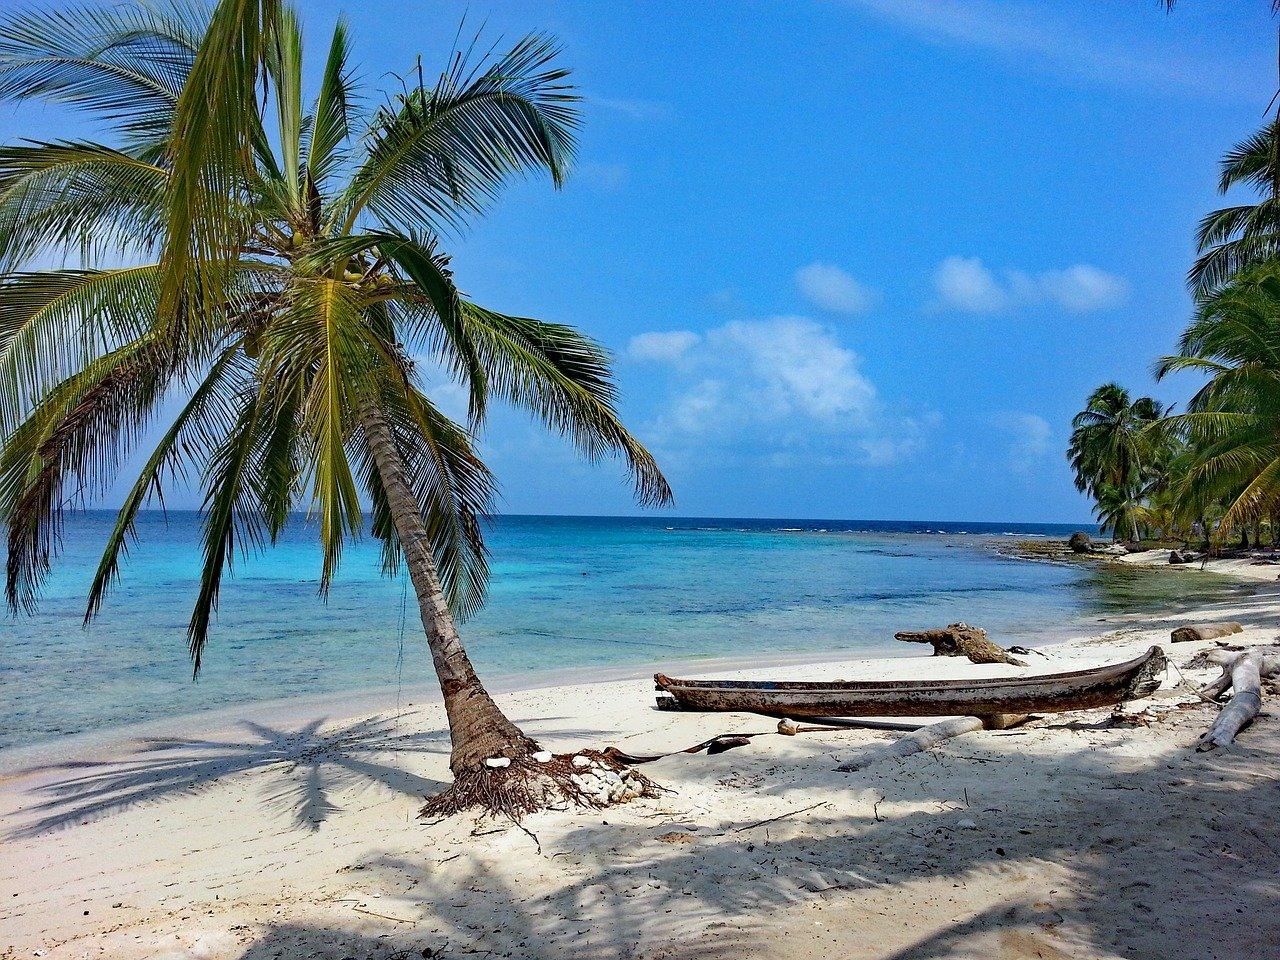 San Blas Islands – A Piece of Heaven 10